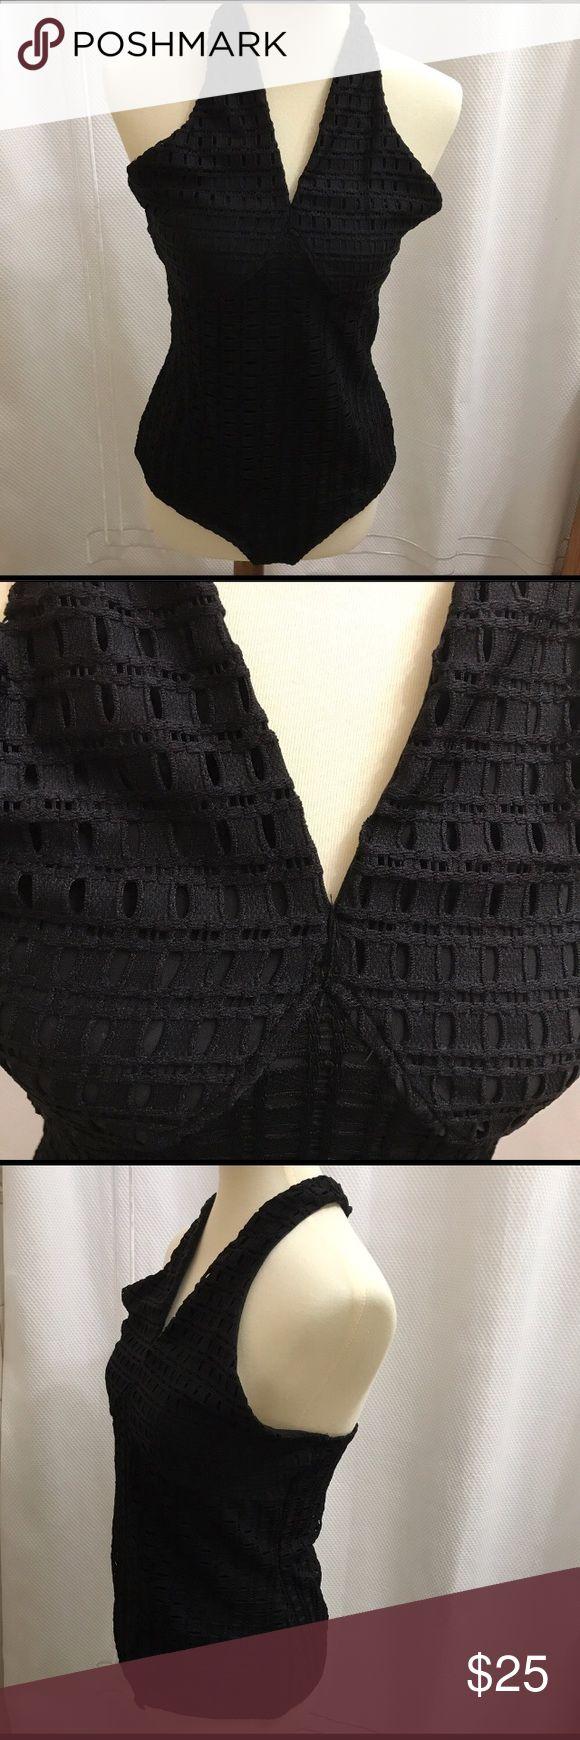 Guess Textured Halter Bodysuit - Black. Guess Textured Halter Bodysuit - Black. Guess Tops